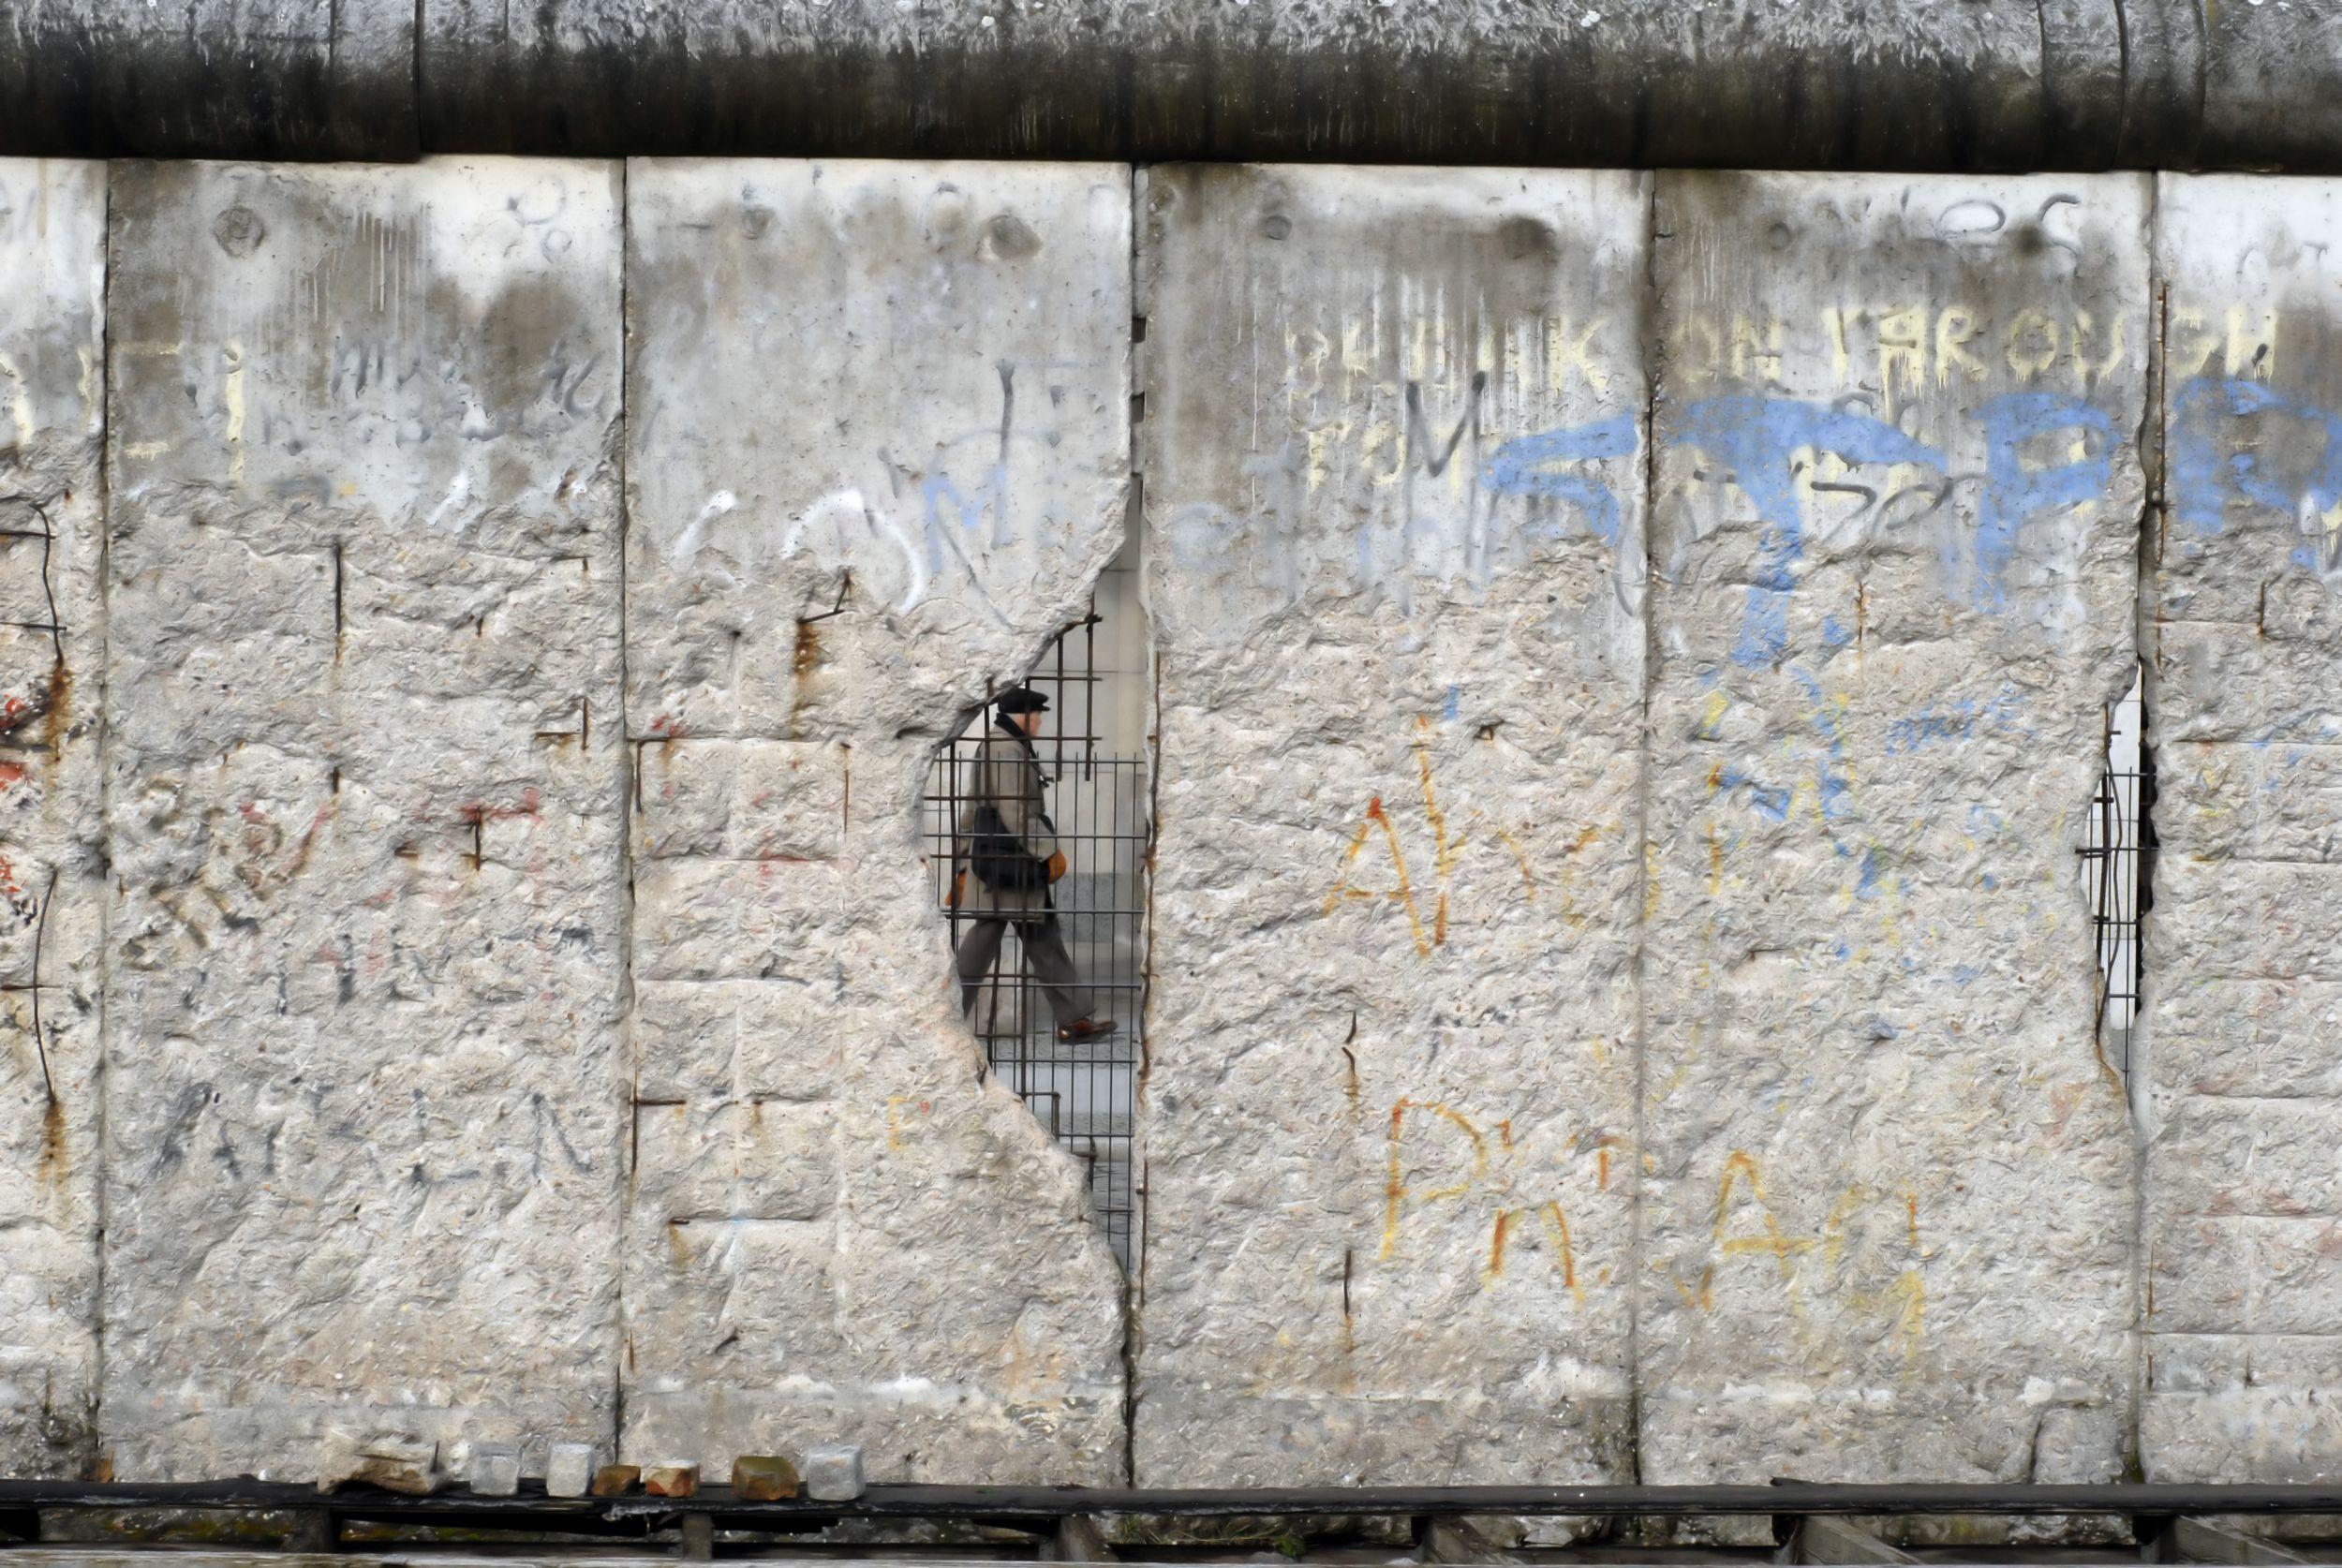 Pozostałości muru (fot. Carsten Medom Madsen / Shutterstock.com)